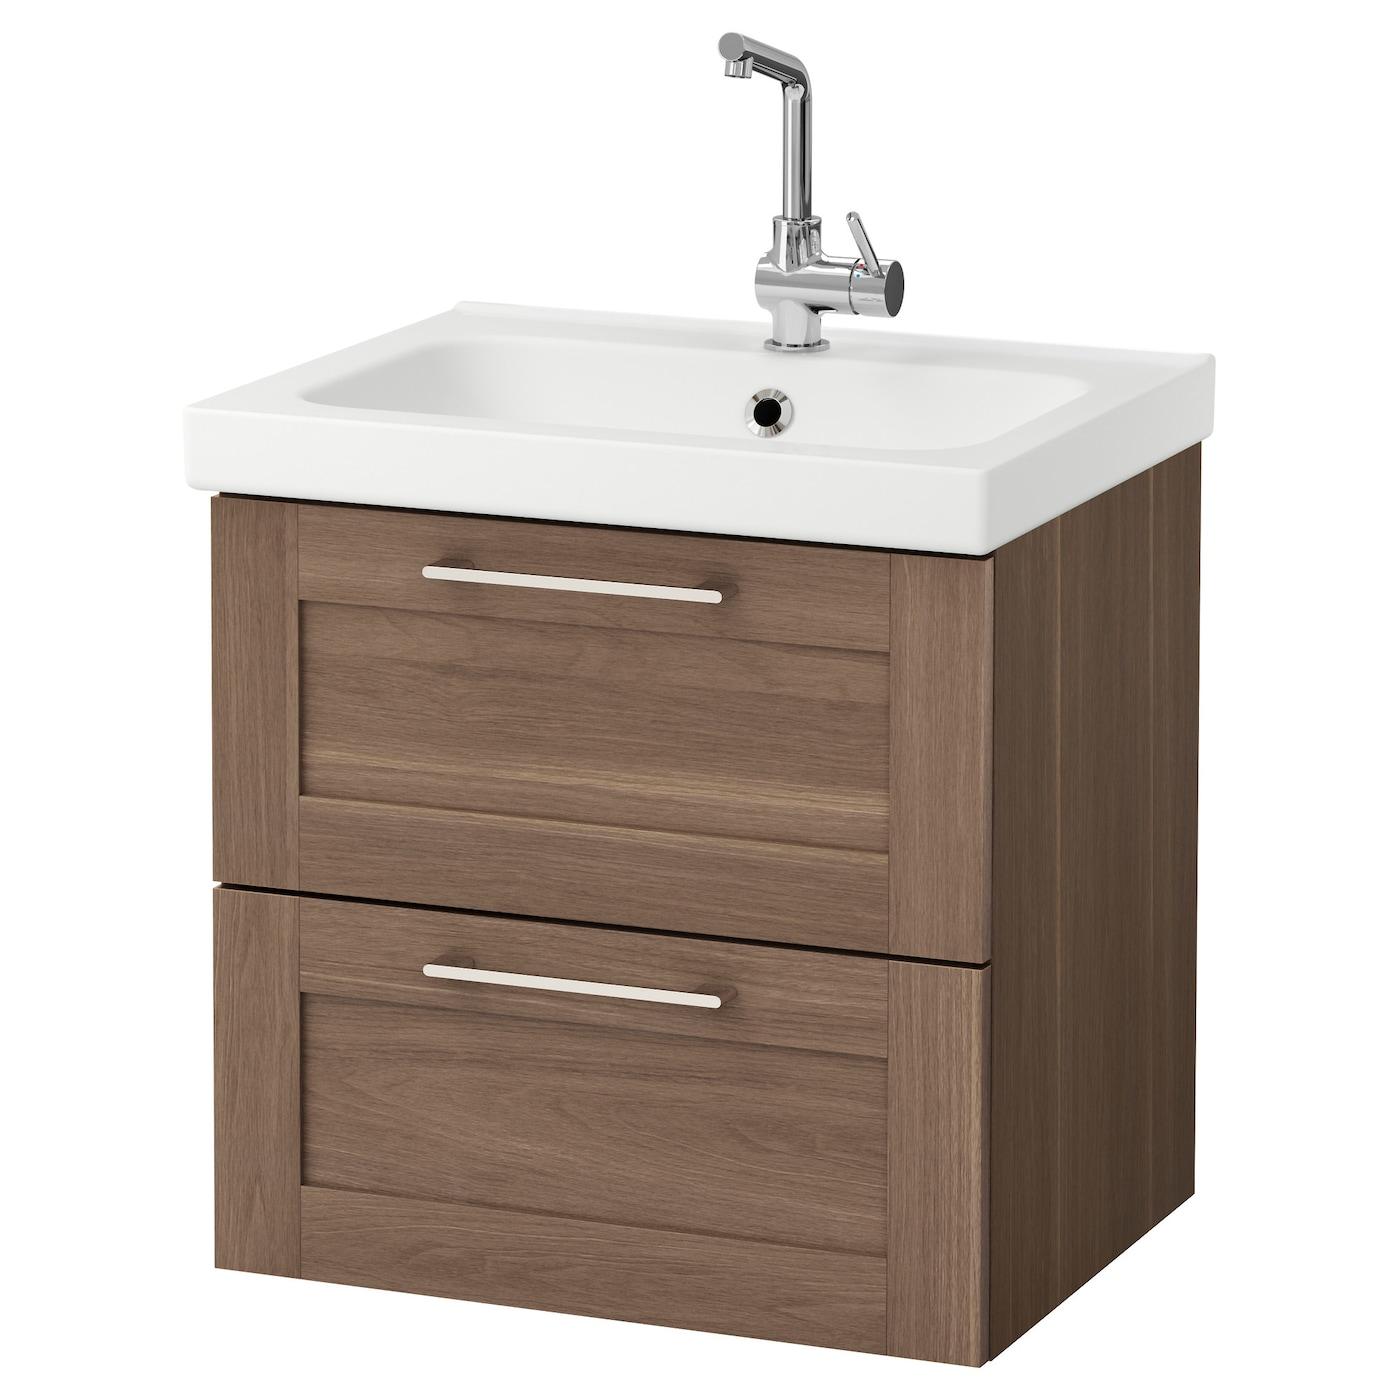 Odensvik godmorgon meuble lavabo 2tir motif noyer 63x49x64 cm ikea - Meuble salle de bain ikea godmorgon ...